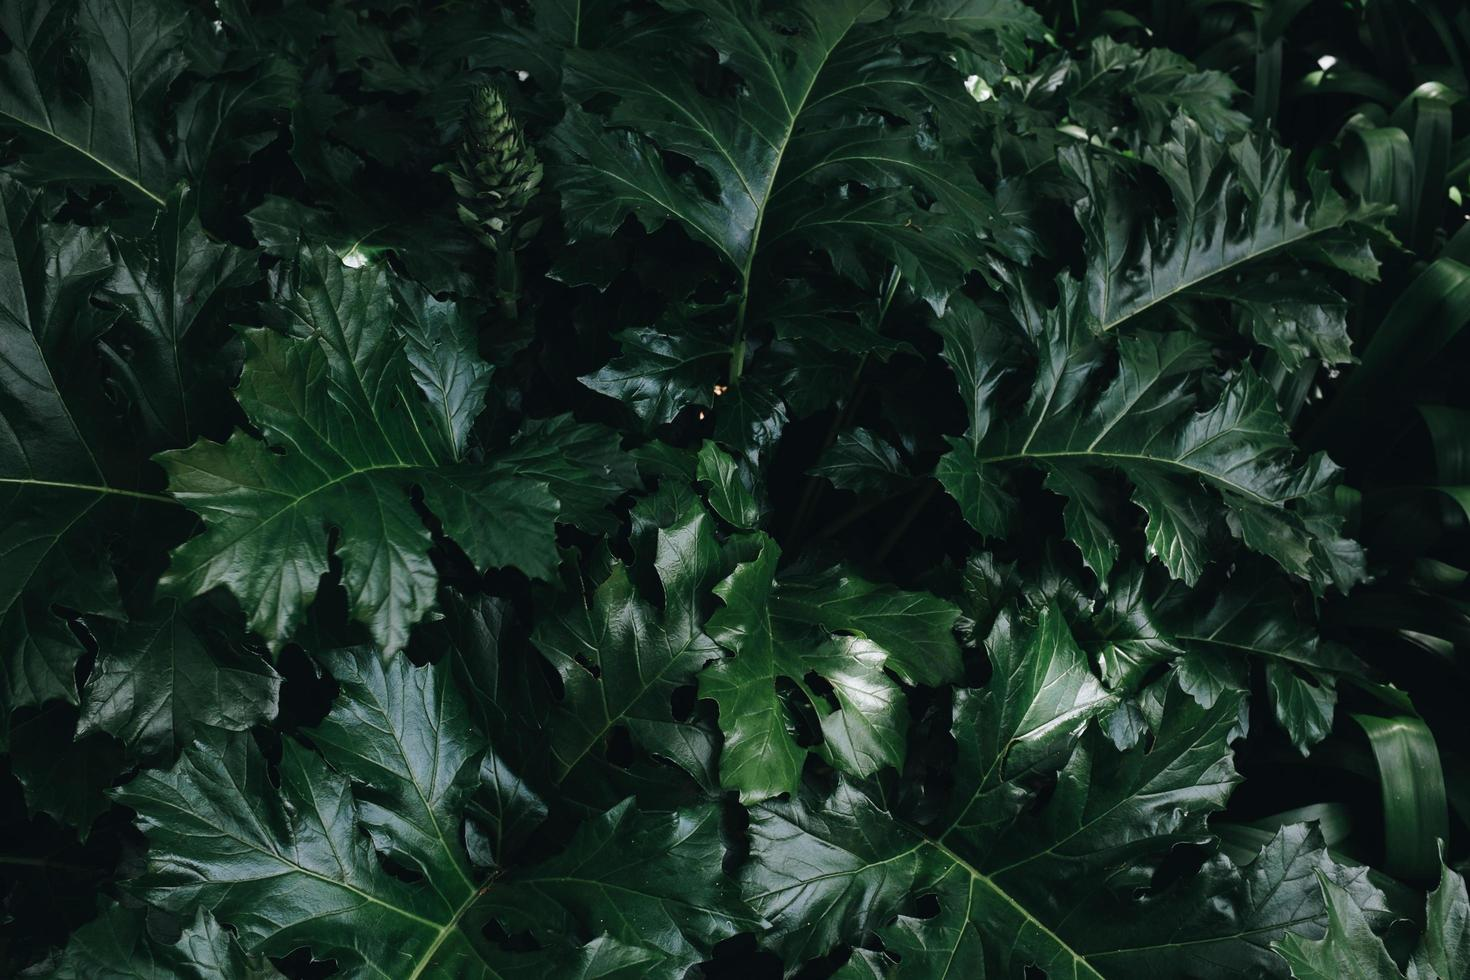 Green leaf plant photo